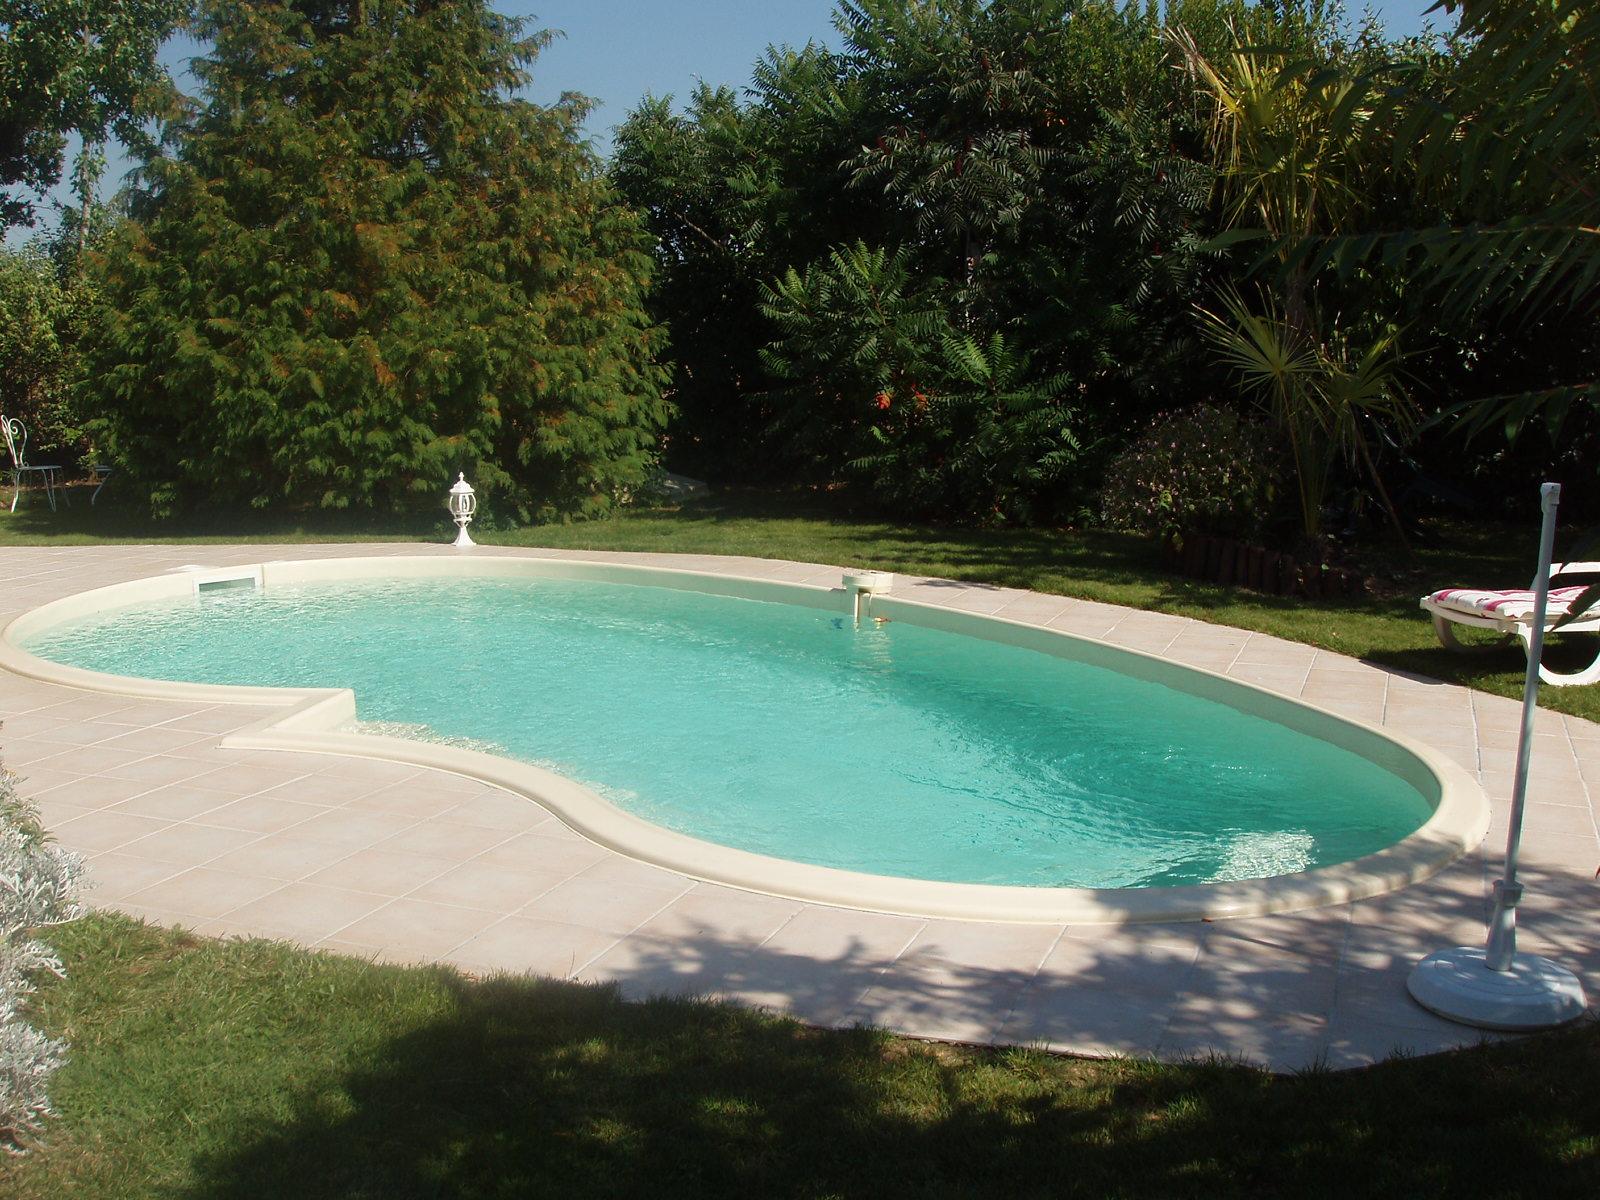 filtration piscine bulle d'air